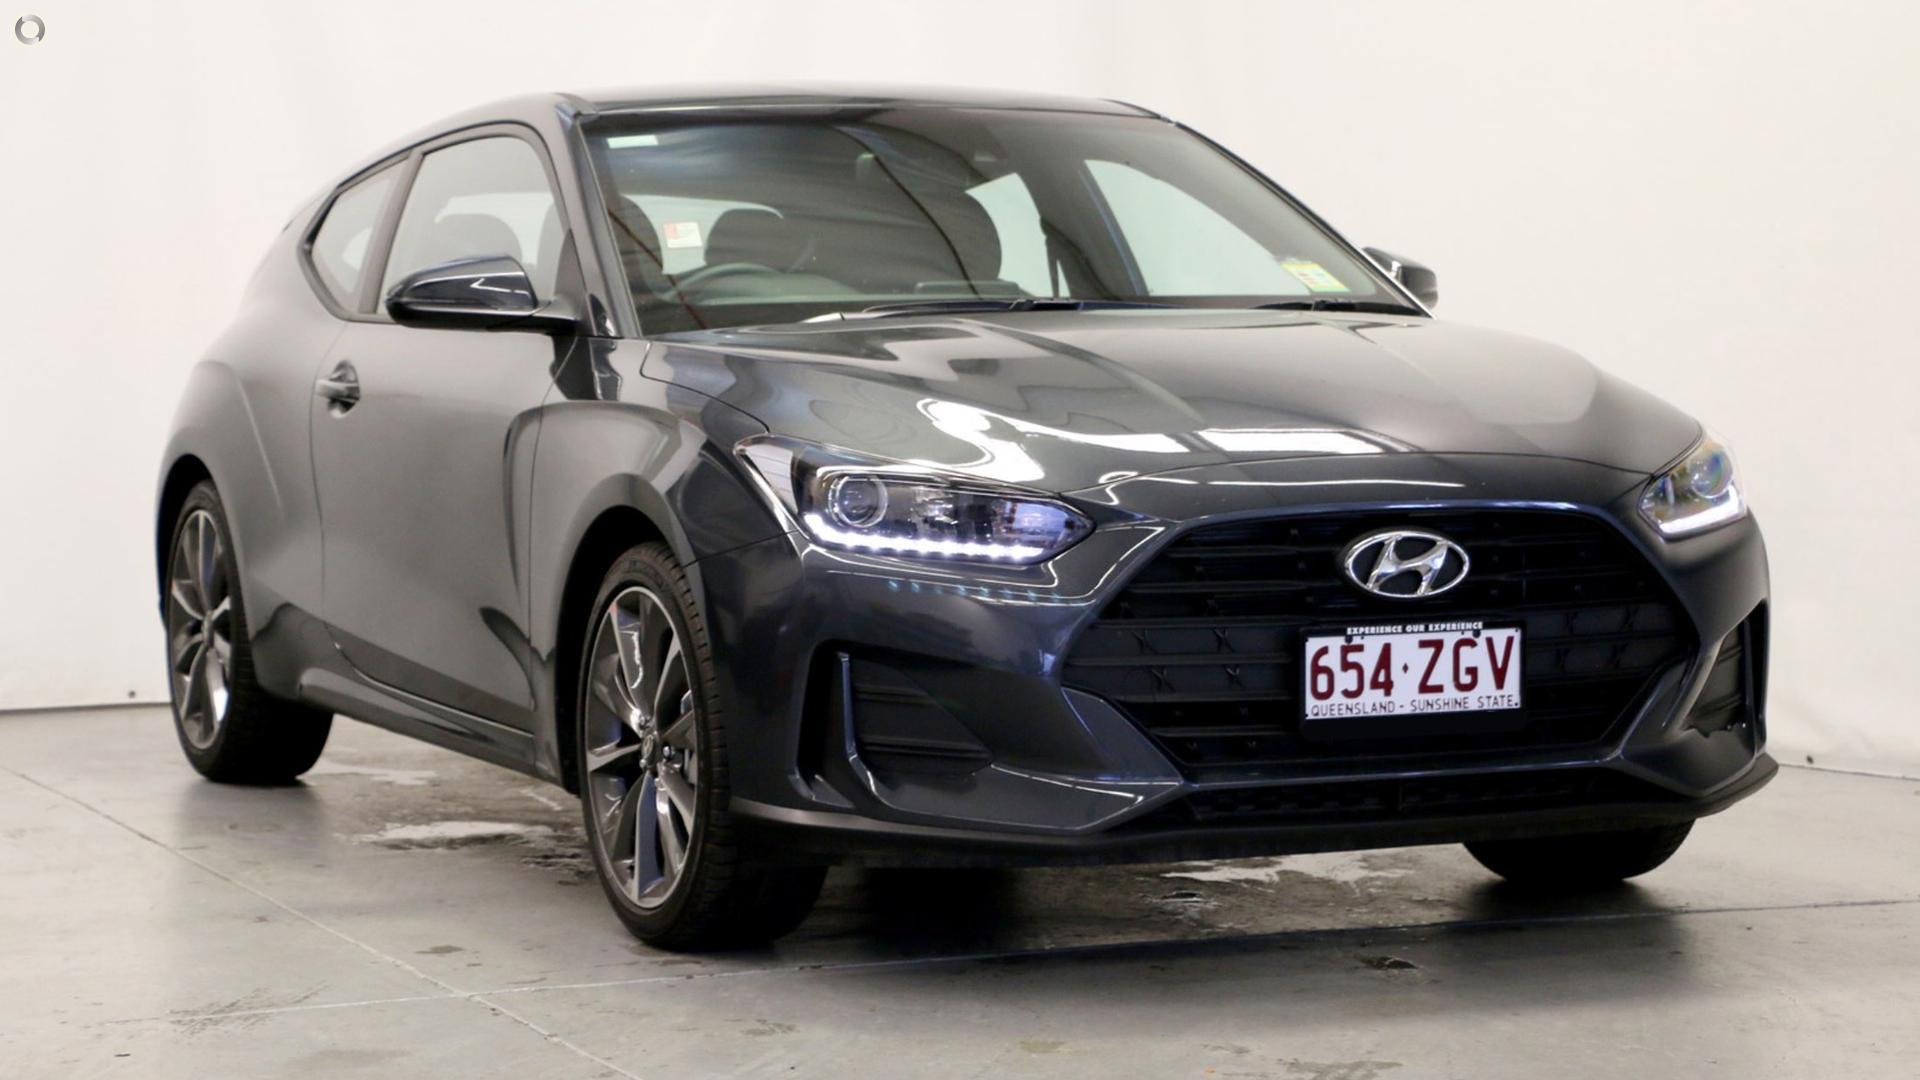 2019 Hyundai Veloster JS